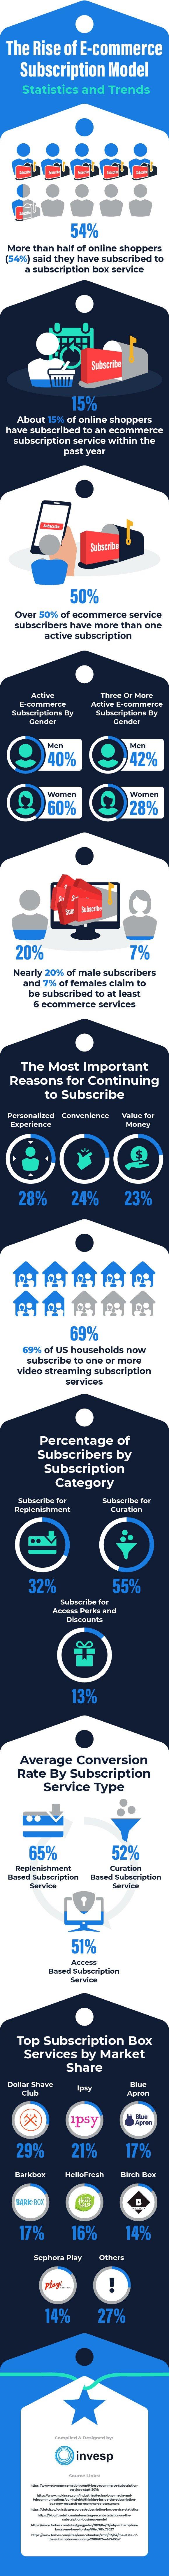 ecommerce-subscription-model-2